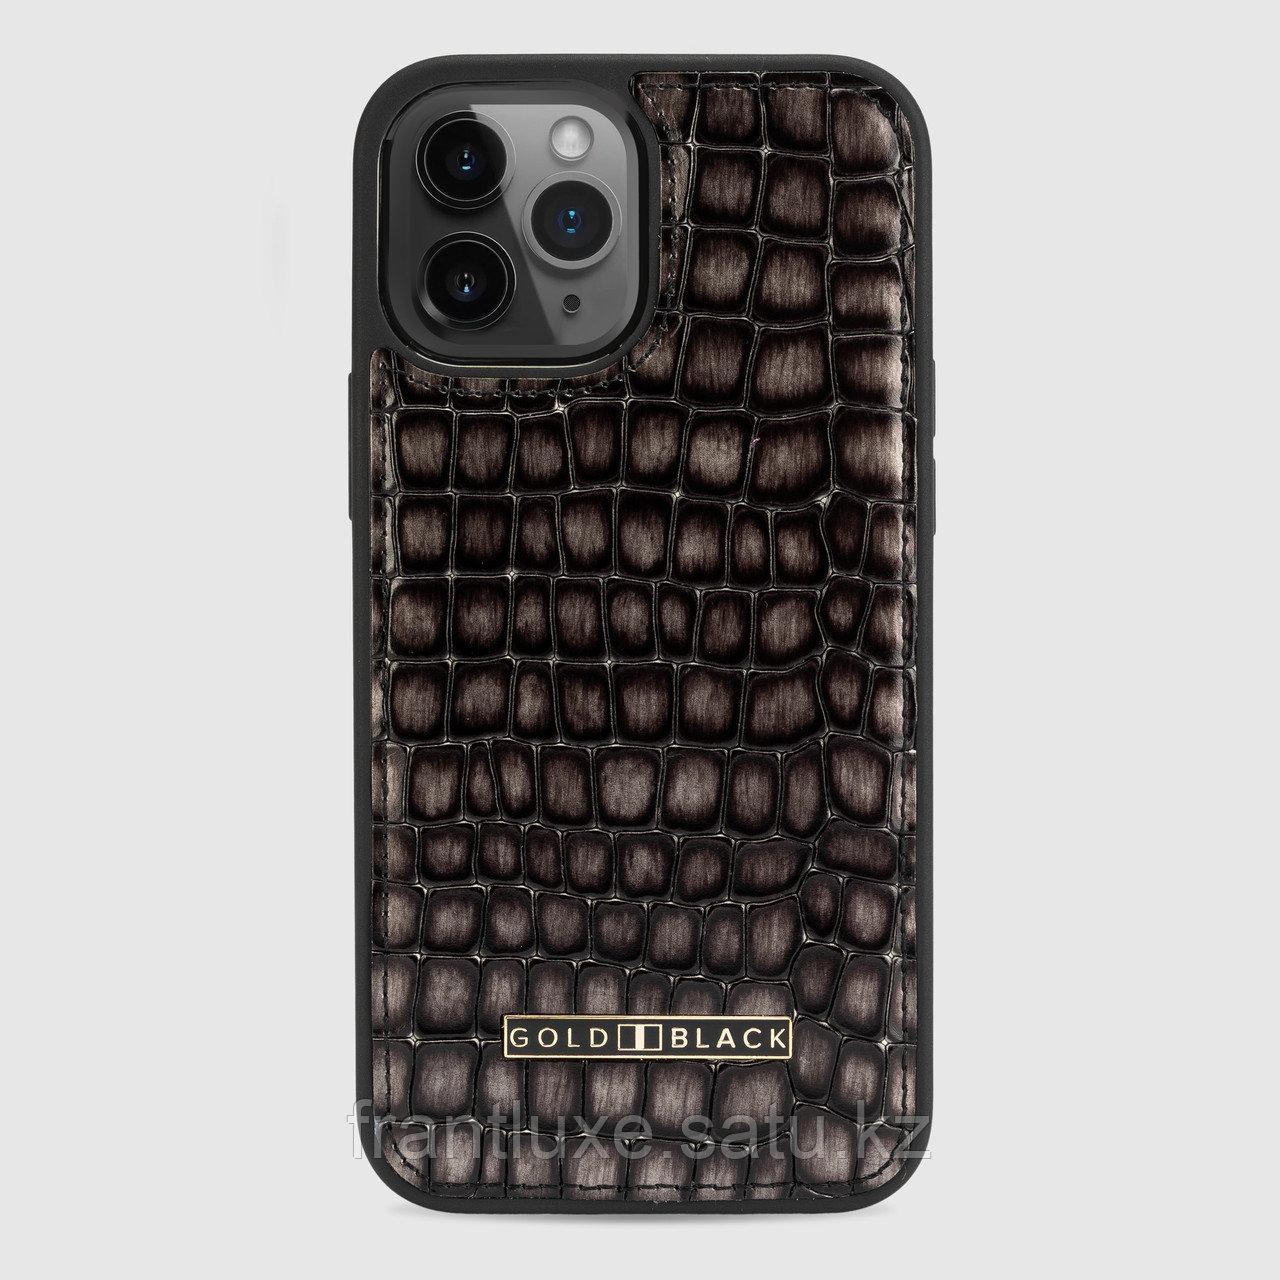 Чехол для телефона iPhone 12 Pro Max серый - фото 1